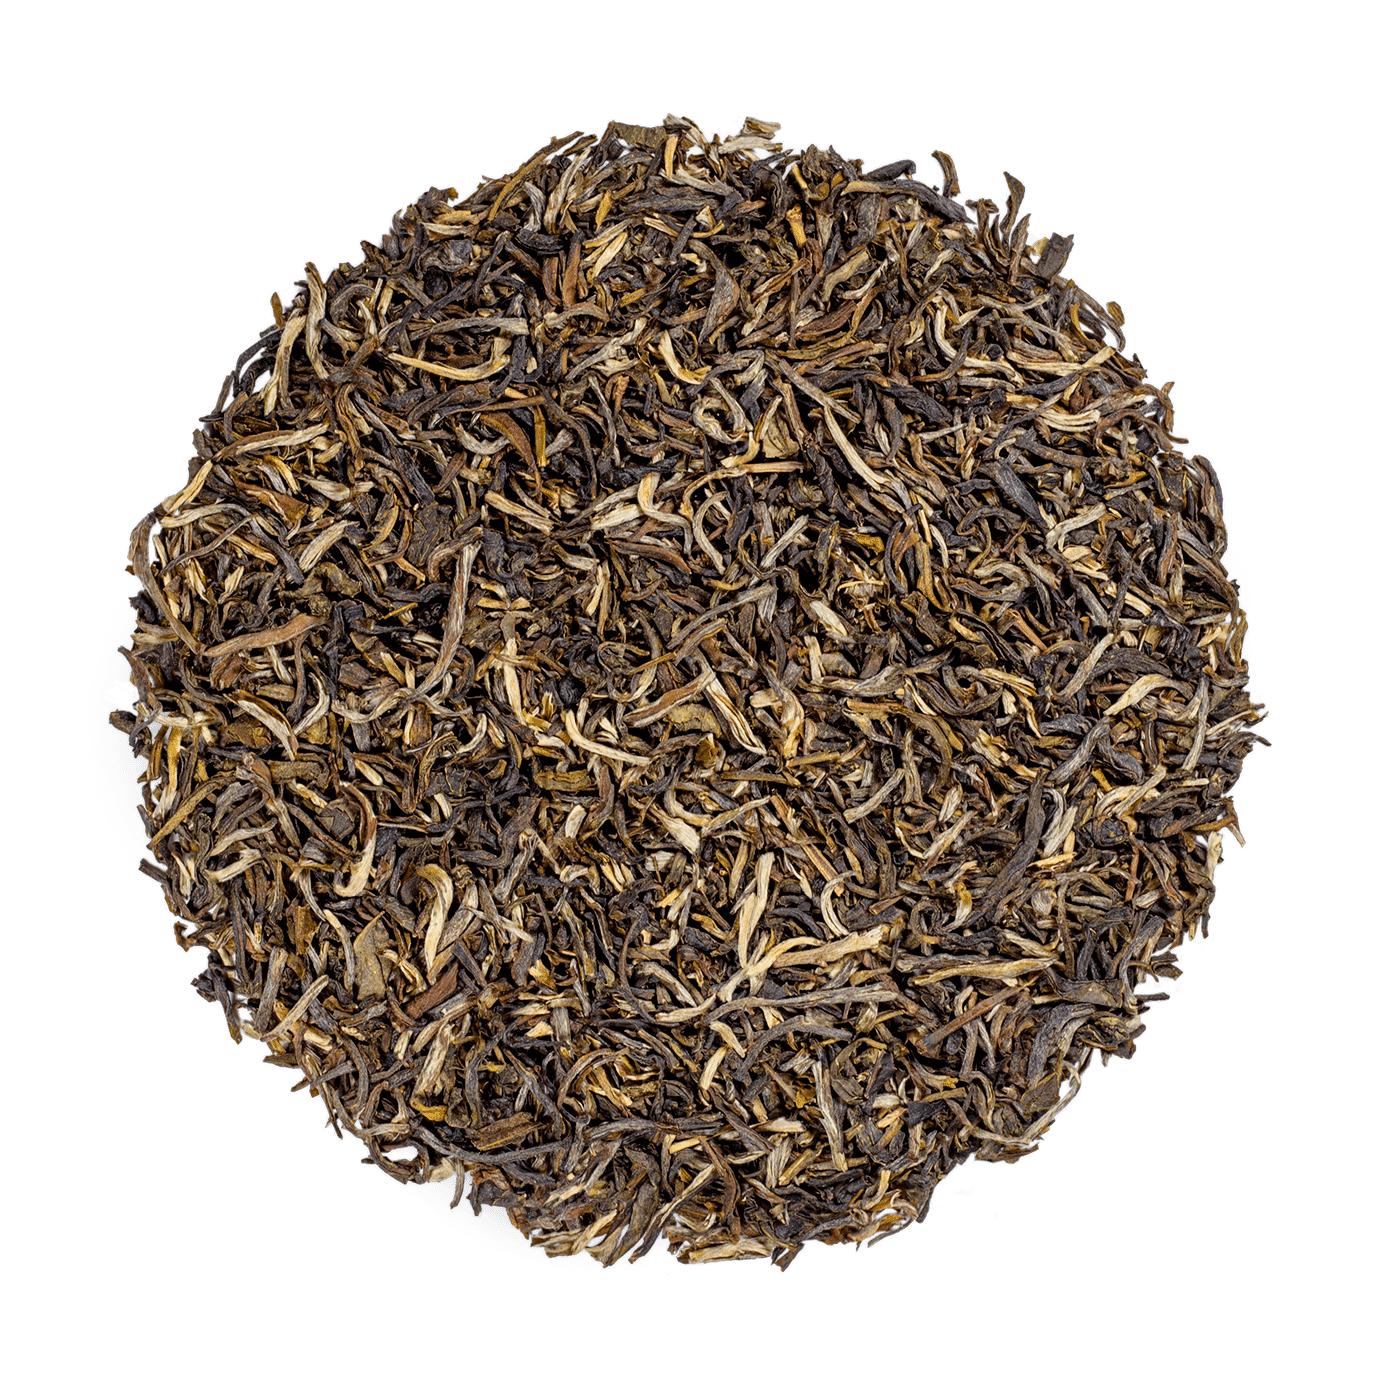 KUSMI TEA White Anastasia bio - Thé blanc, bergamote - Thé en vrac - Kusmi Tea